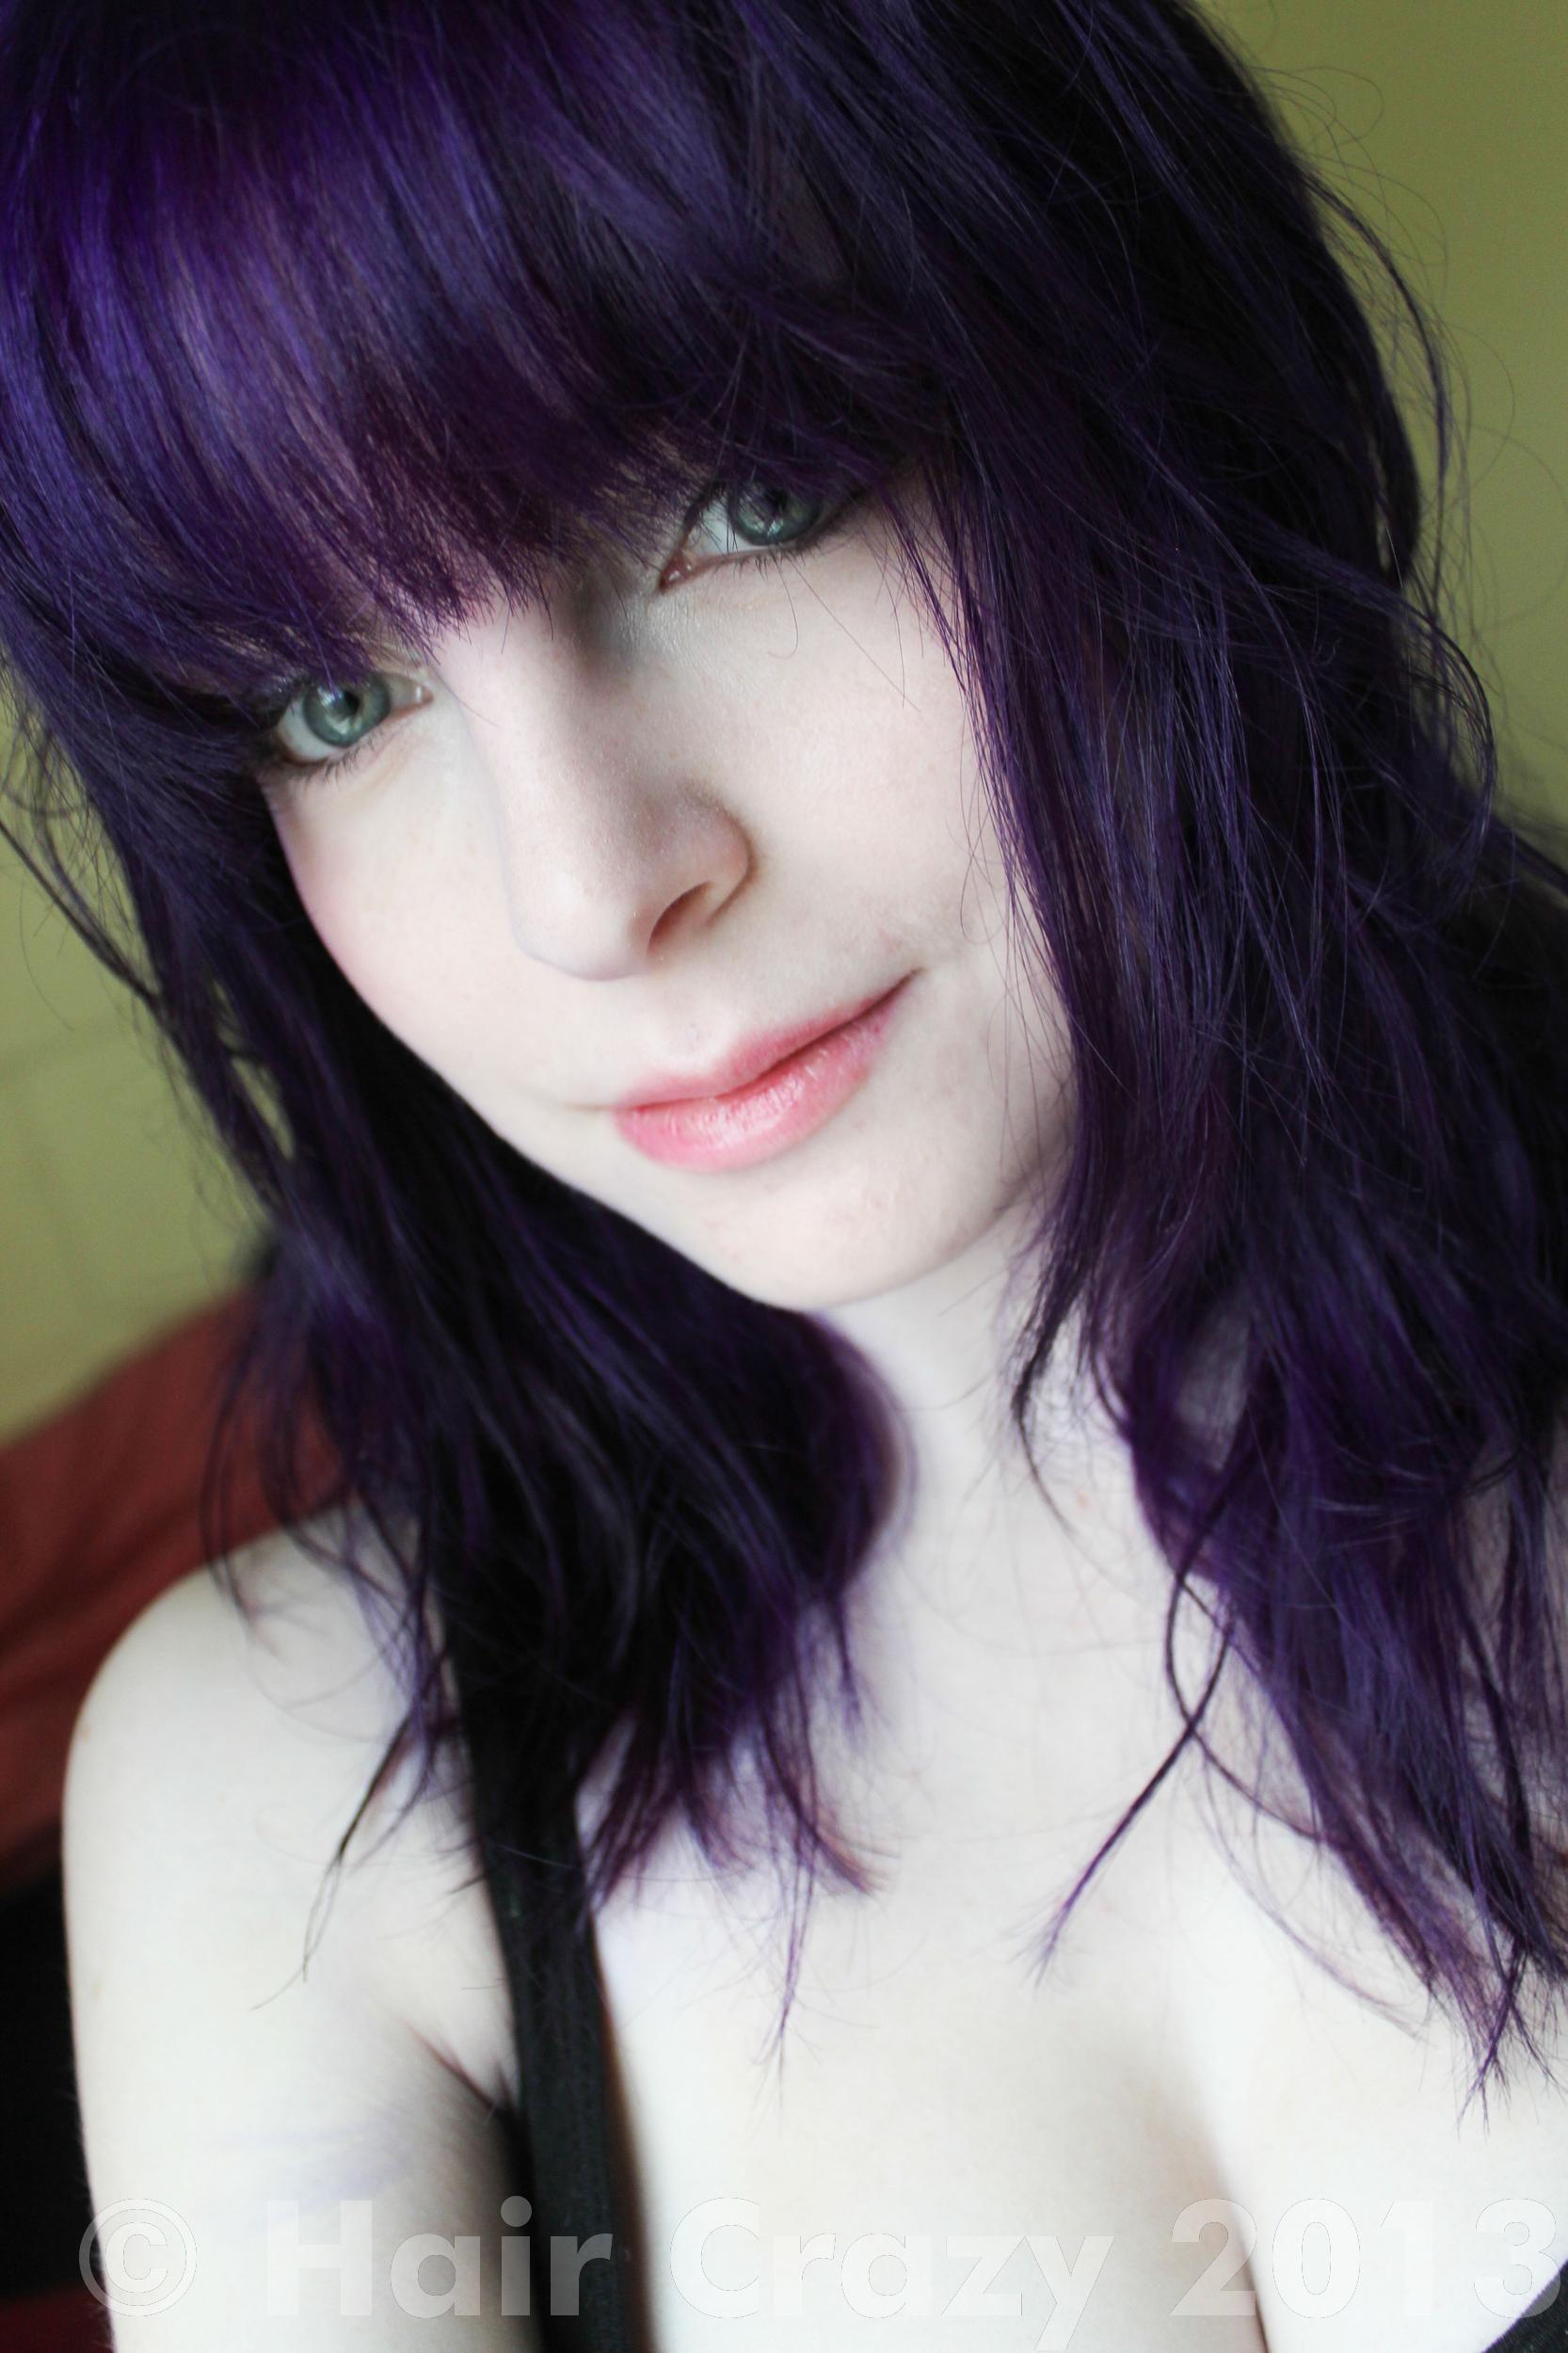 pravana hair color purple - Google Search